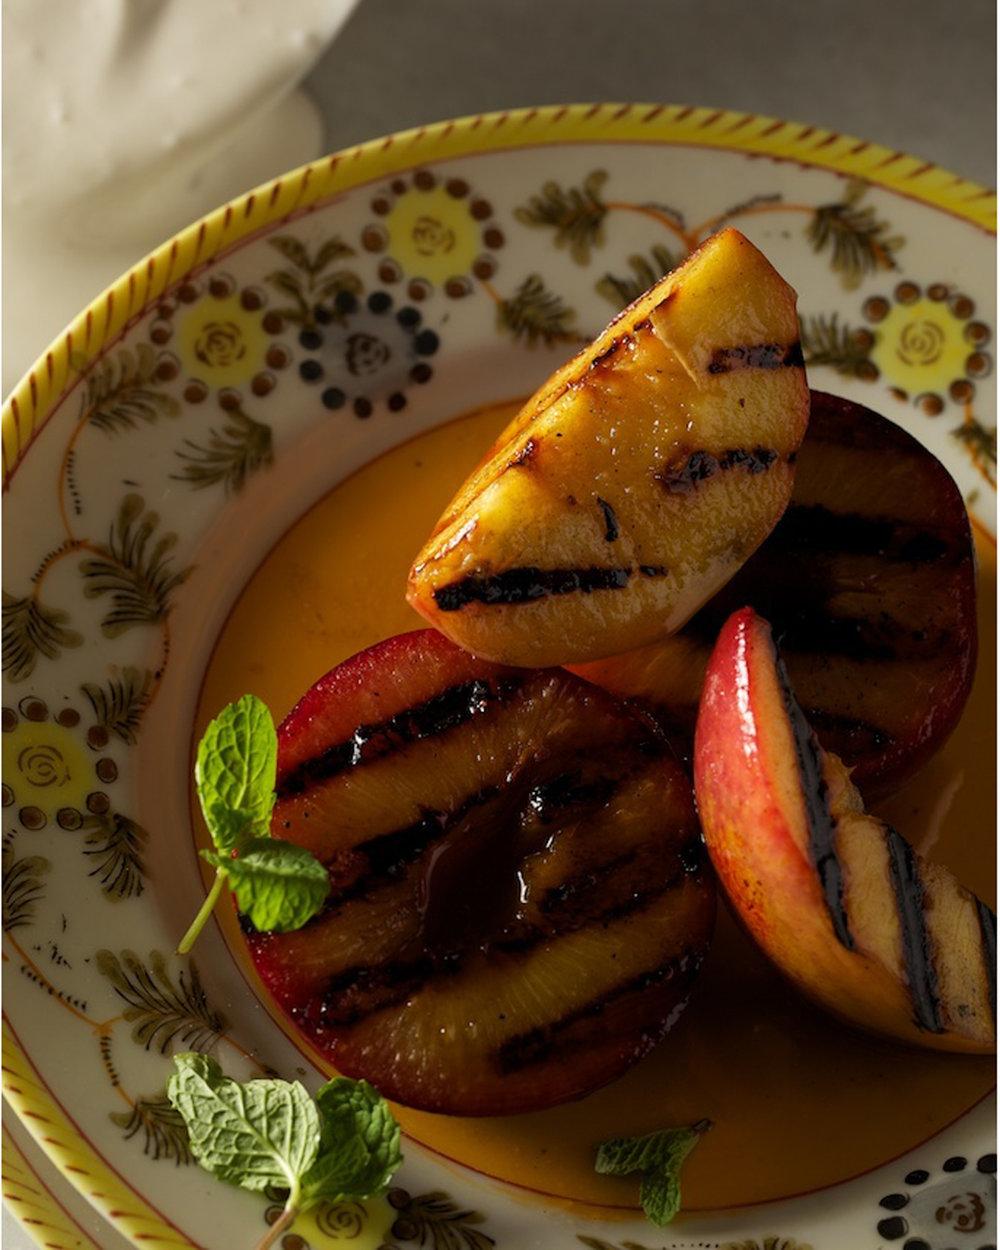 Paulette+Tavormina+Beekman+Dessert+Grilled+Peaches.jpeg